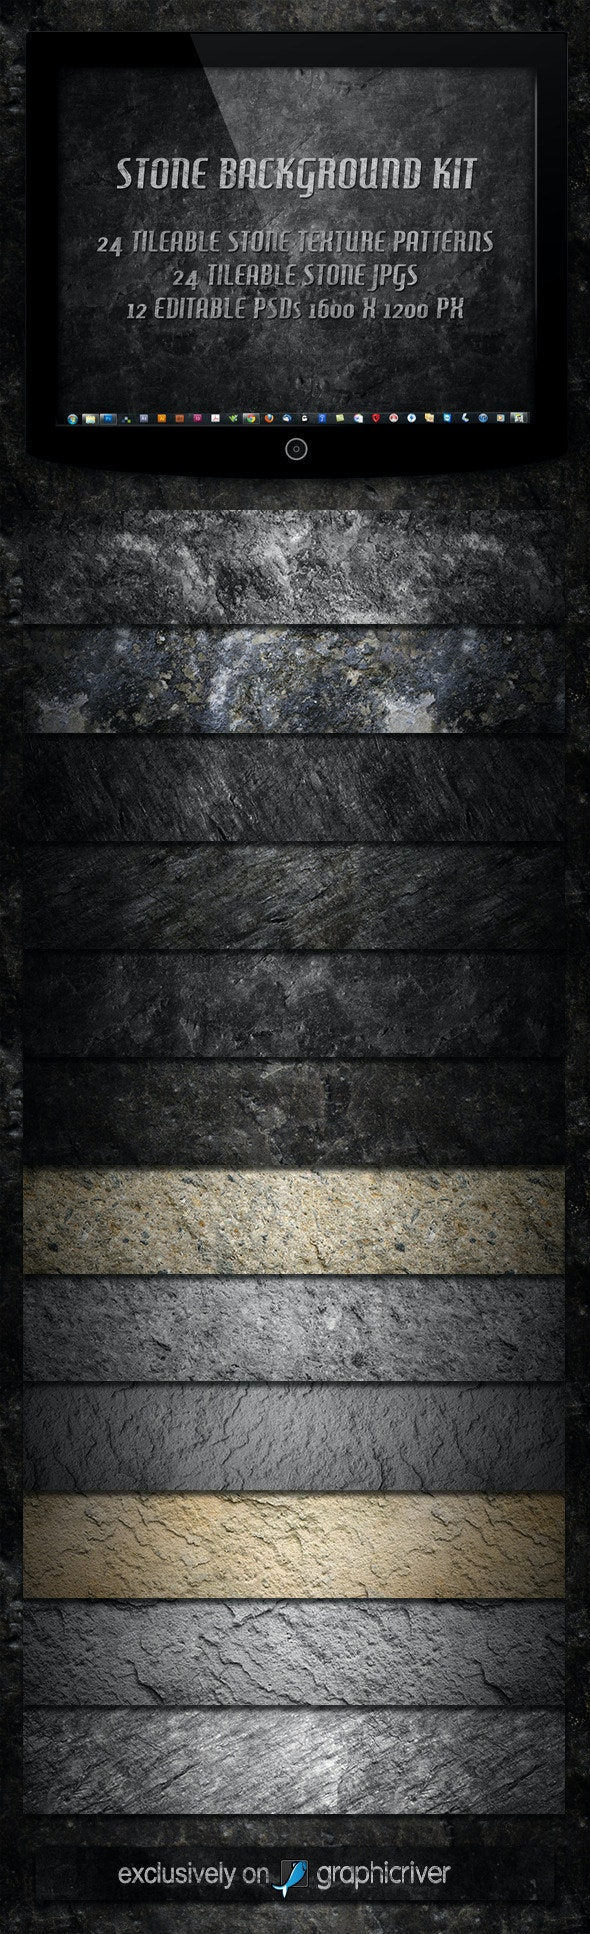 12 Tileable Stone Textures Background Kit - Textures / Fills / Patterns Photoshop